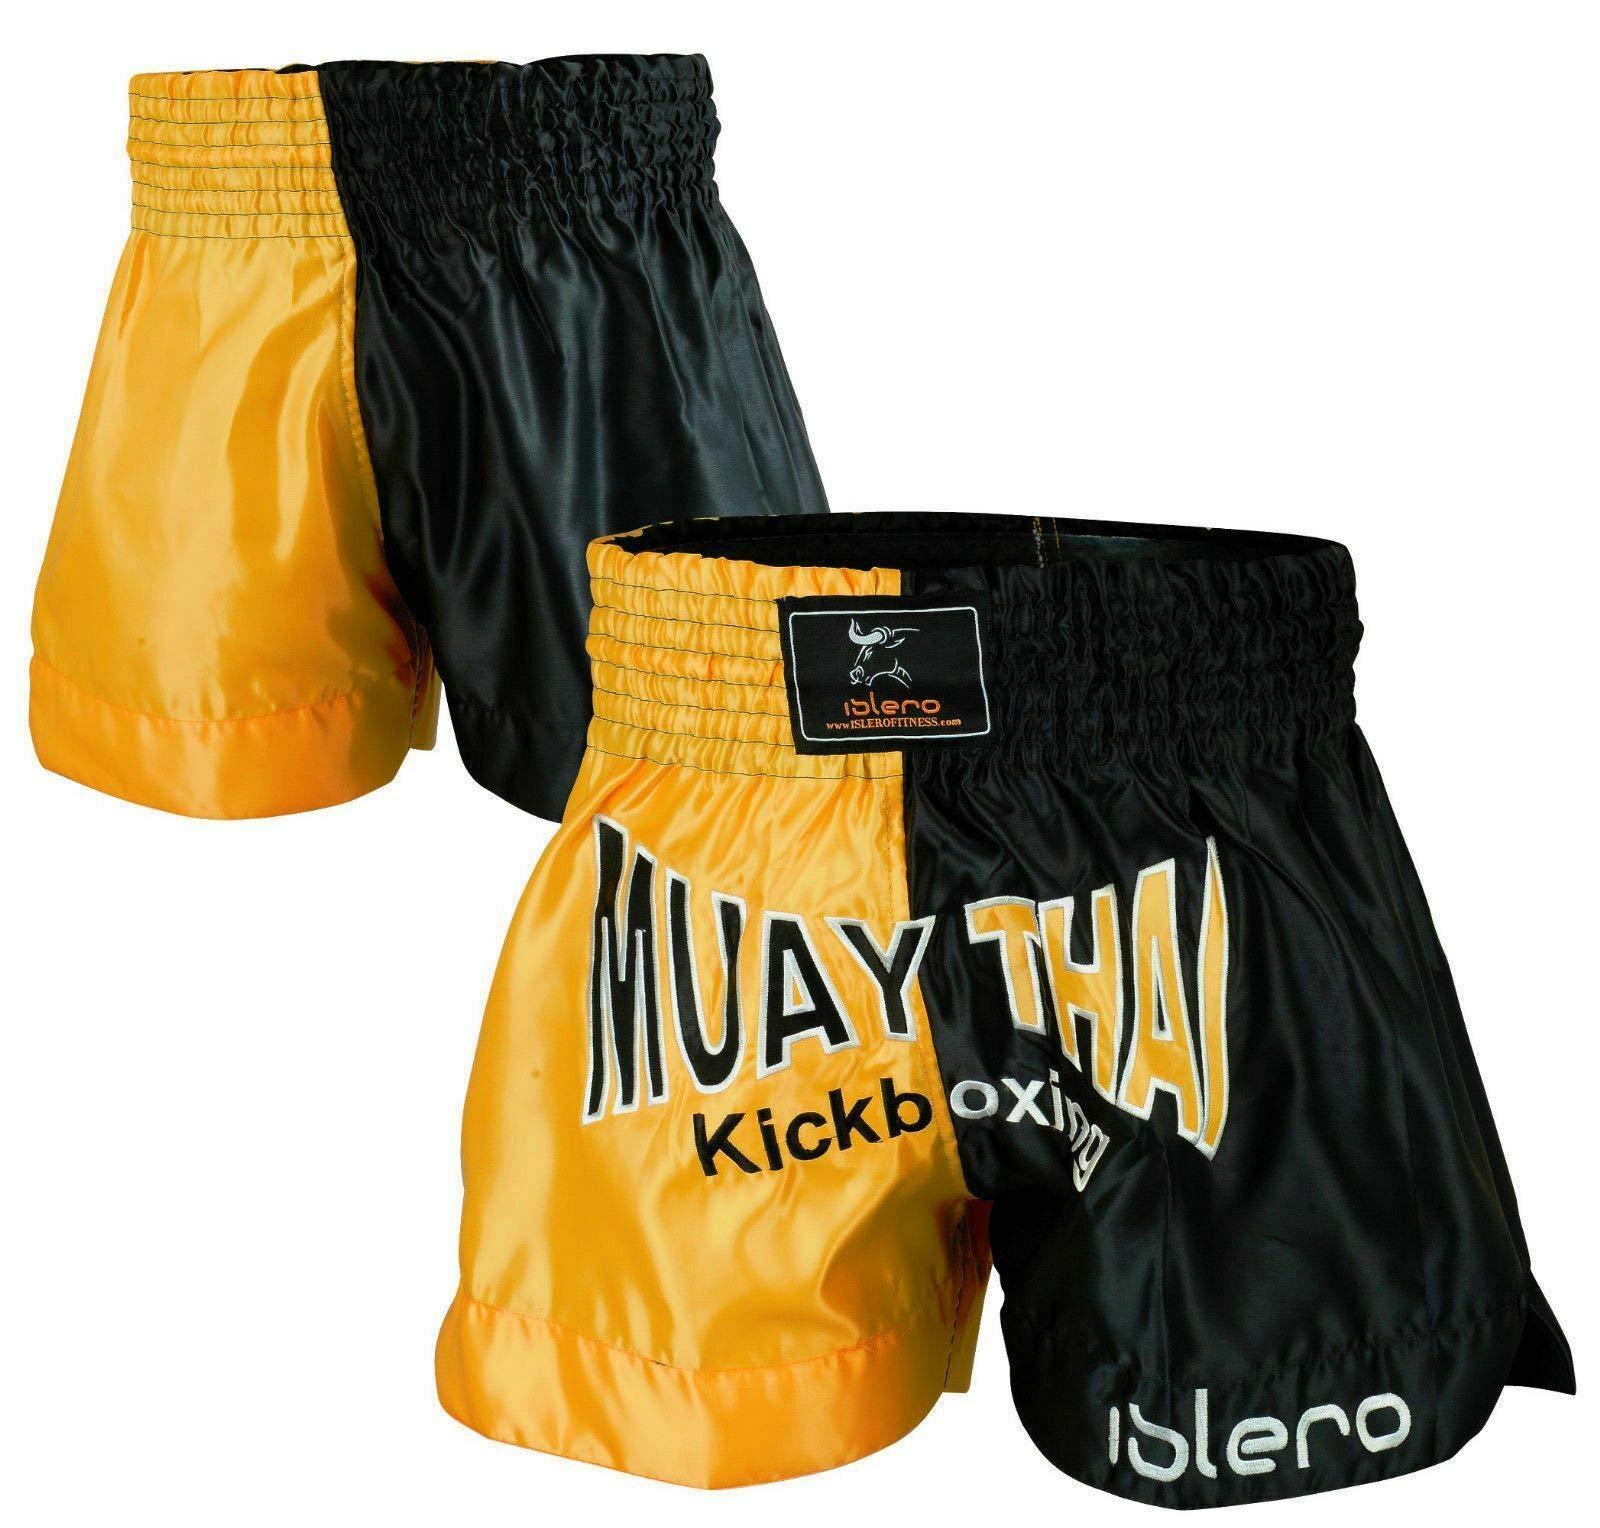 ISLERO Muay Thai Fight Shorts MMA Kick Boxing Grappling Martial Arts Gear UFC